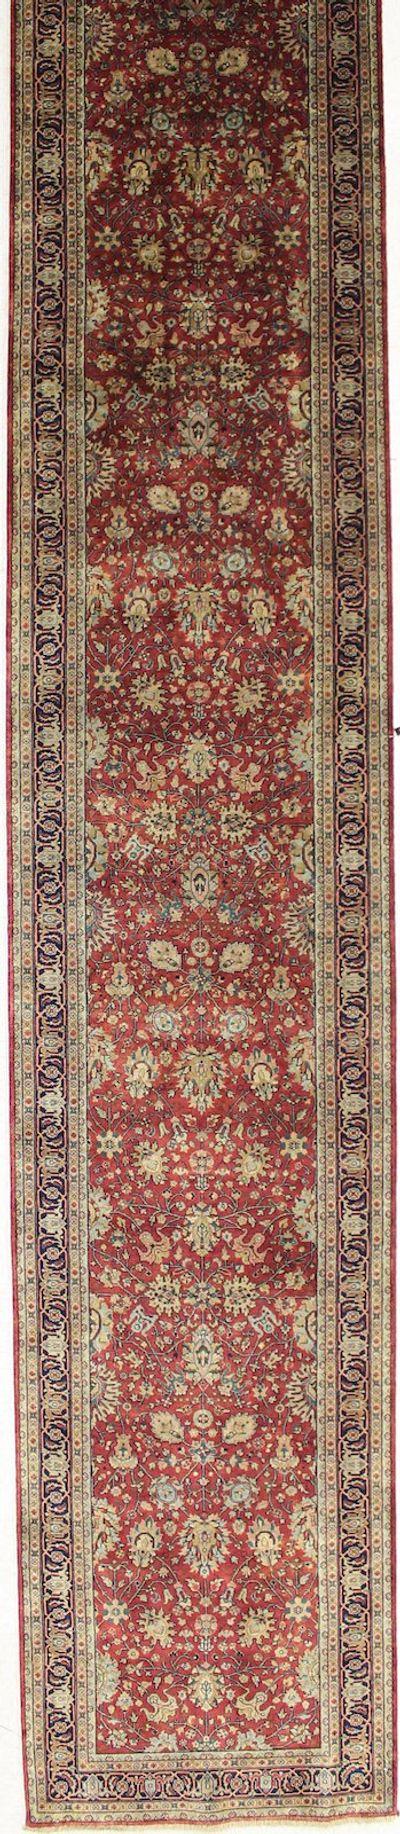 BURGUNDY Tabriz Rug #2346 • 3′2″ x 19′1″ • 100% Wool